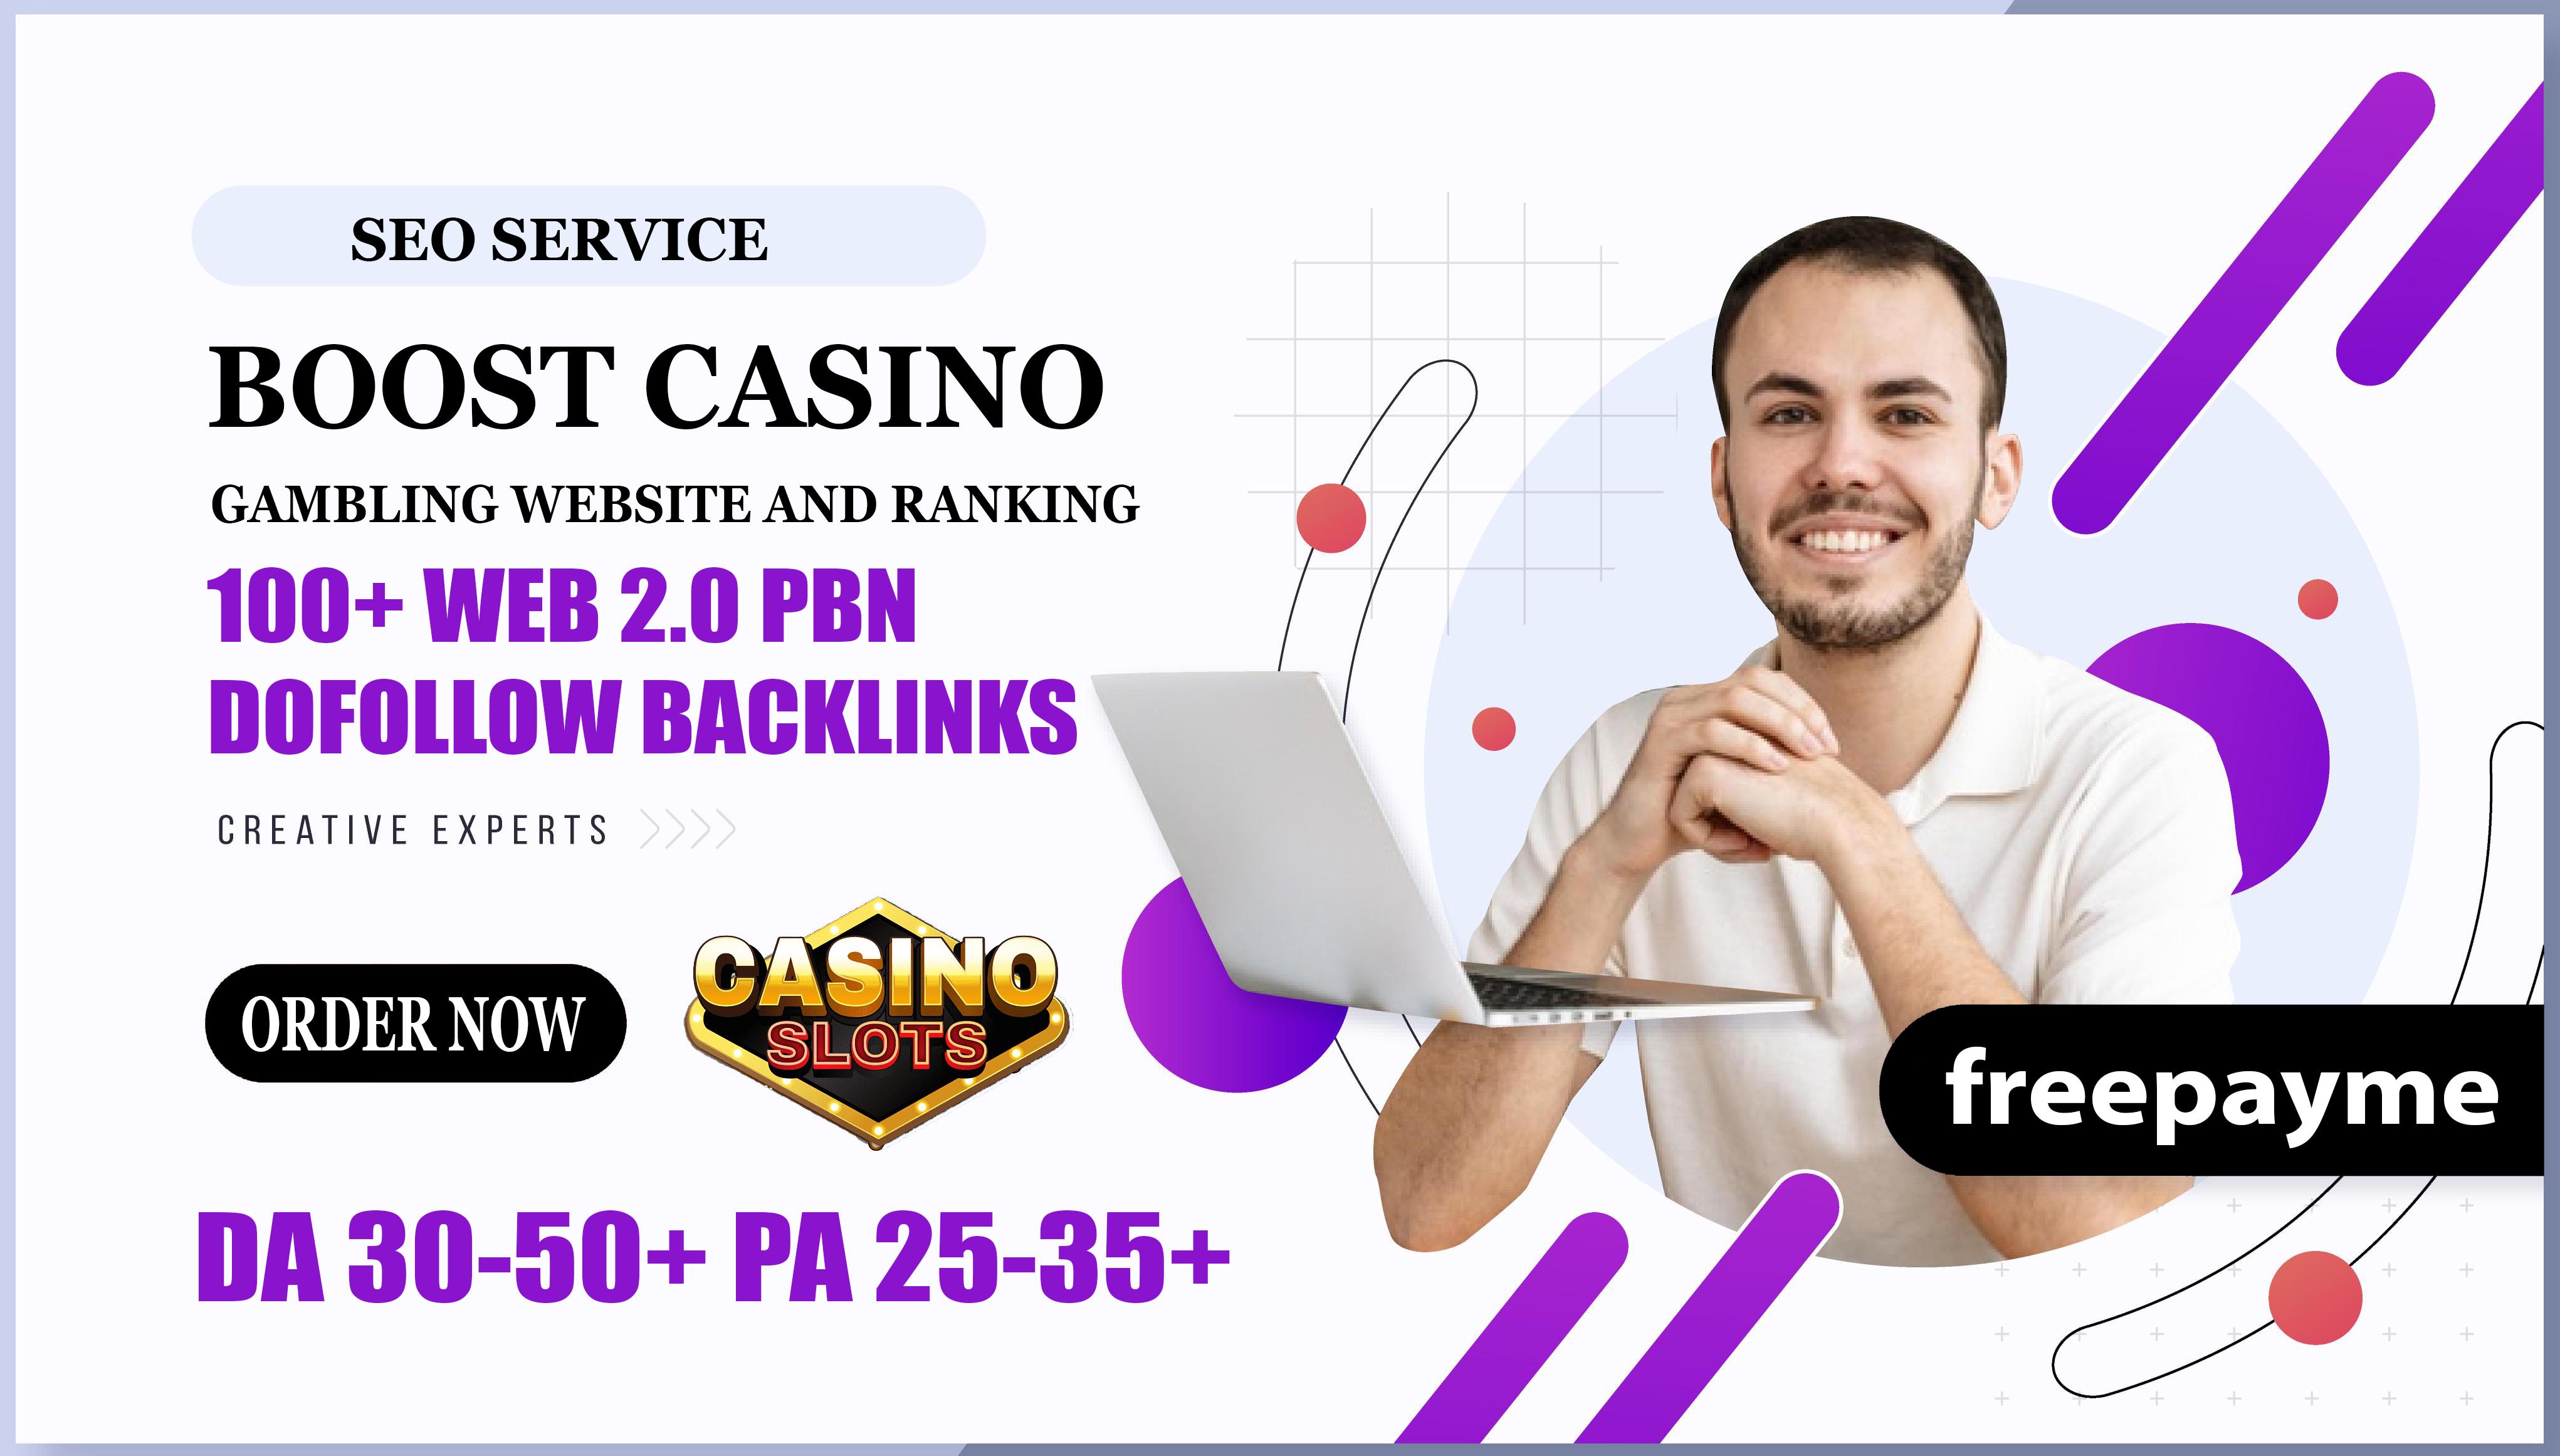 100+ Web 2.0 PBN Dofollow Backlinks DA 35+ PA 25+ Boost Casino Gambling Website And Ranking